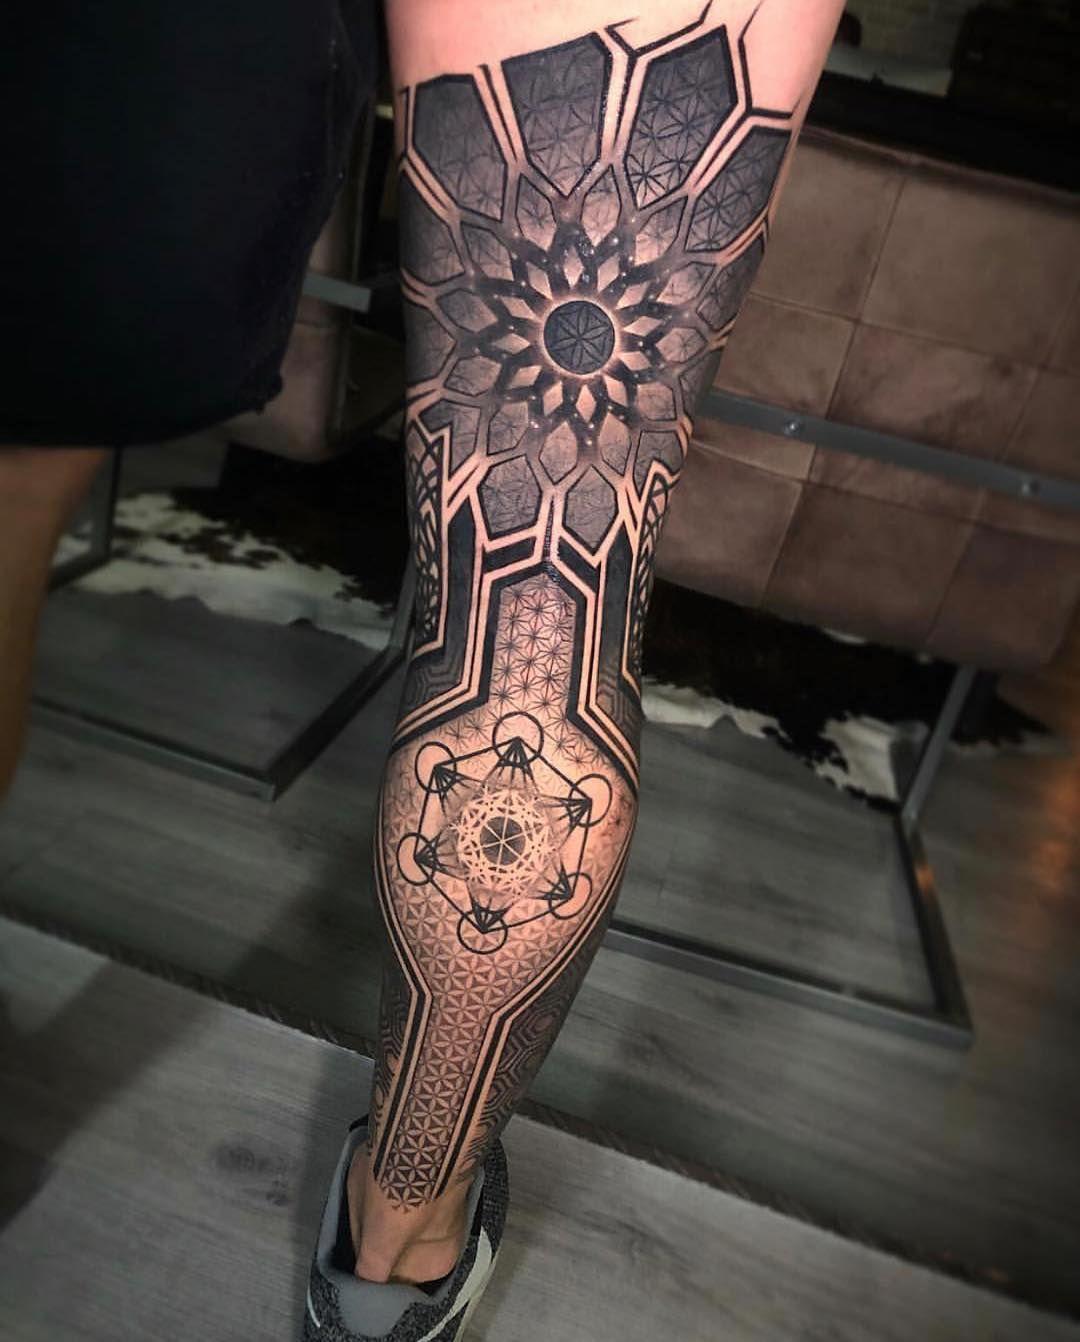 "Photo of GEOMETRIC TATTOO HUNTER on Instagram: ""➕ ➕ Tattoo Artist: @abian_lamotta ➕ ➕ ➕ #blackdotwork #dotworktattoo #geometrical #geometrictattoo #geometricart #mandala #sacredgeometry…"""